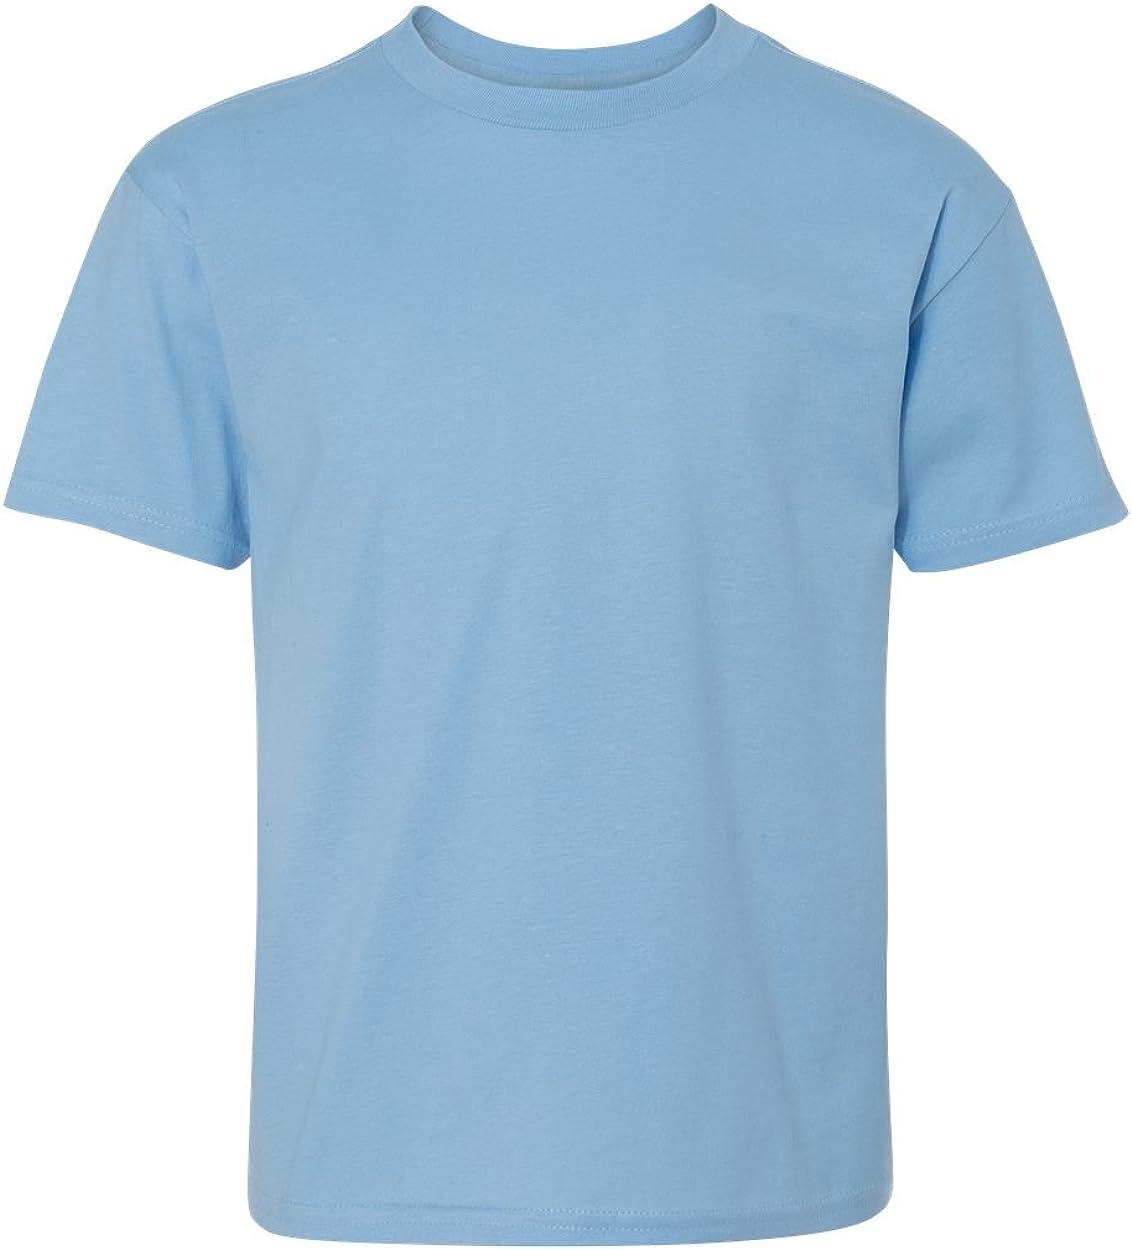 Hanes Youth 4. 100% Ringspun Cotton Nano-T T-Shirt, Light Blue, X-Large